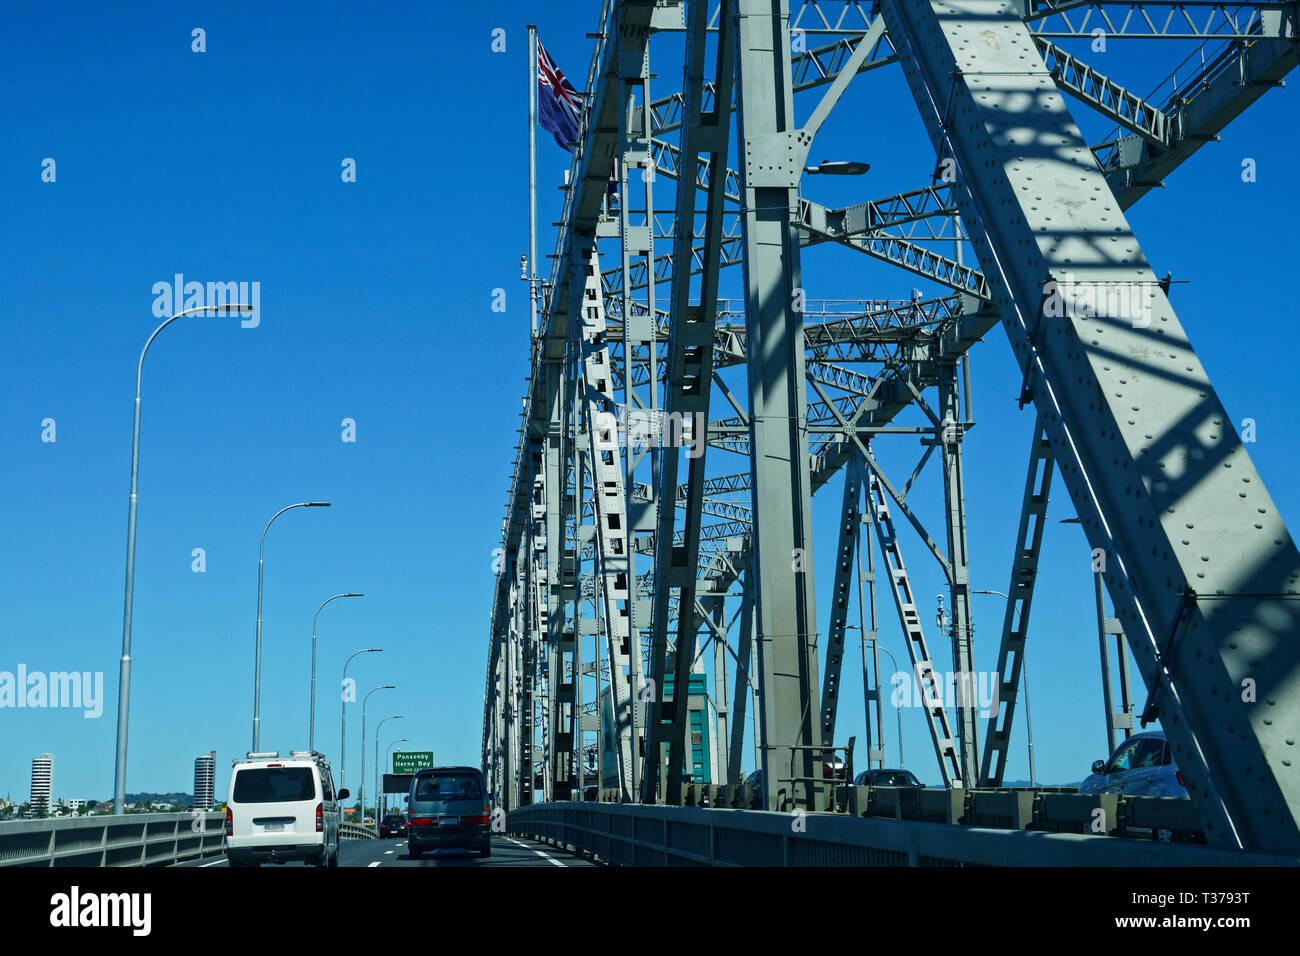 Travelling on Auckland Harbour Bridge, New Zealand. - Stock Image